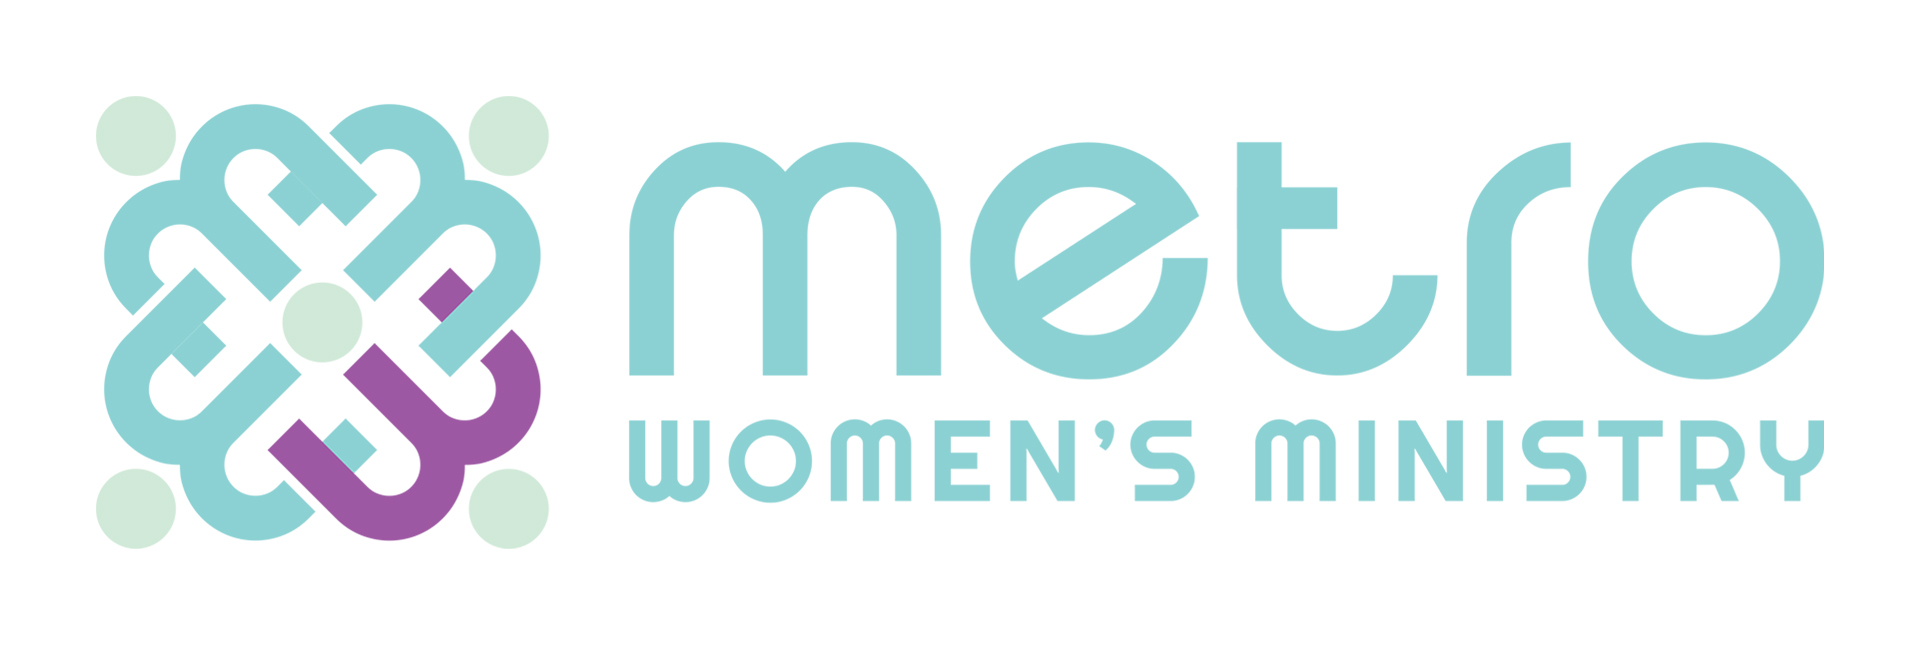 Promo_Womens_Generic.jpg